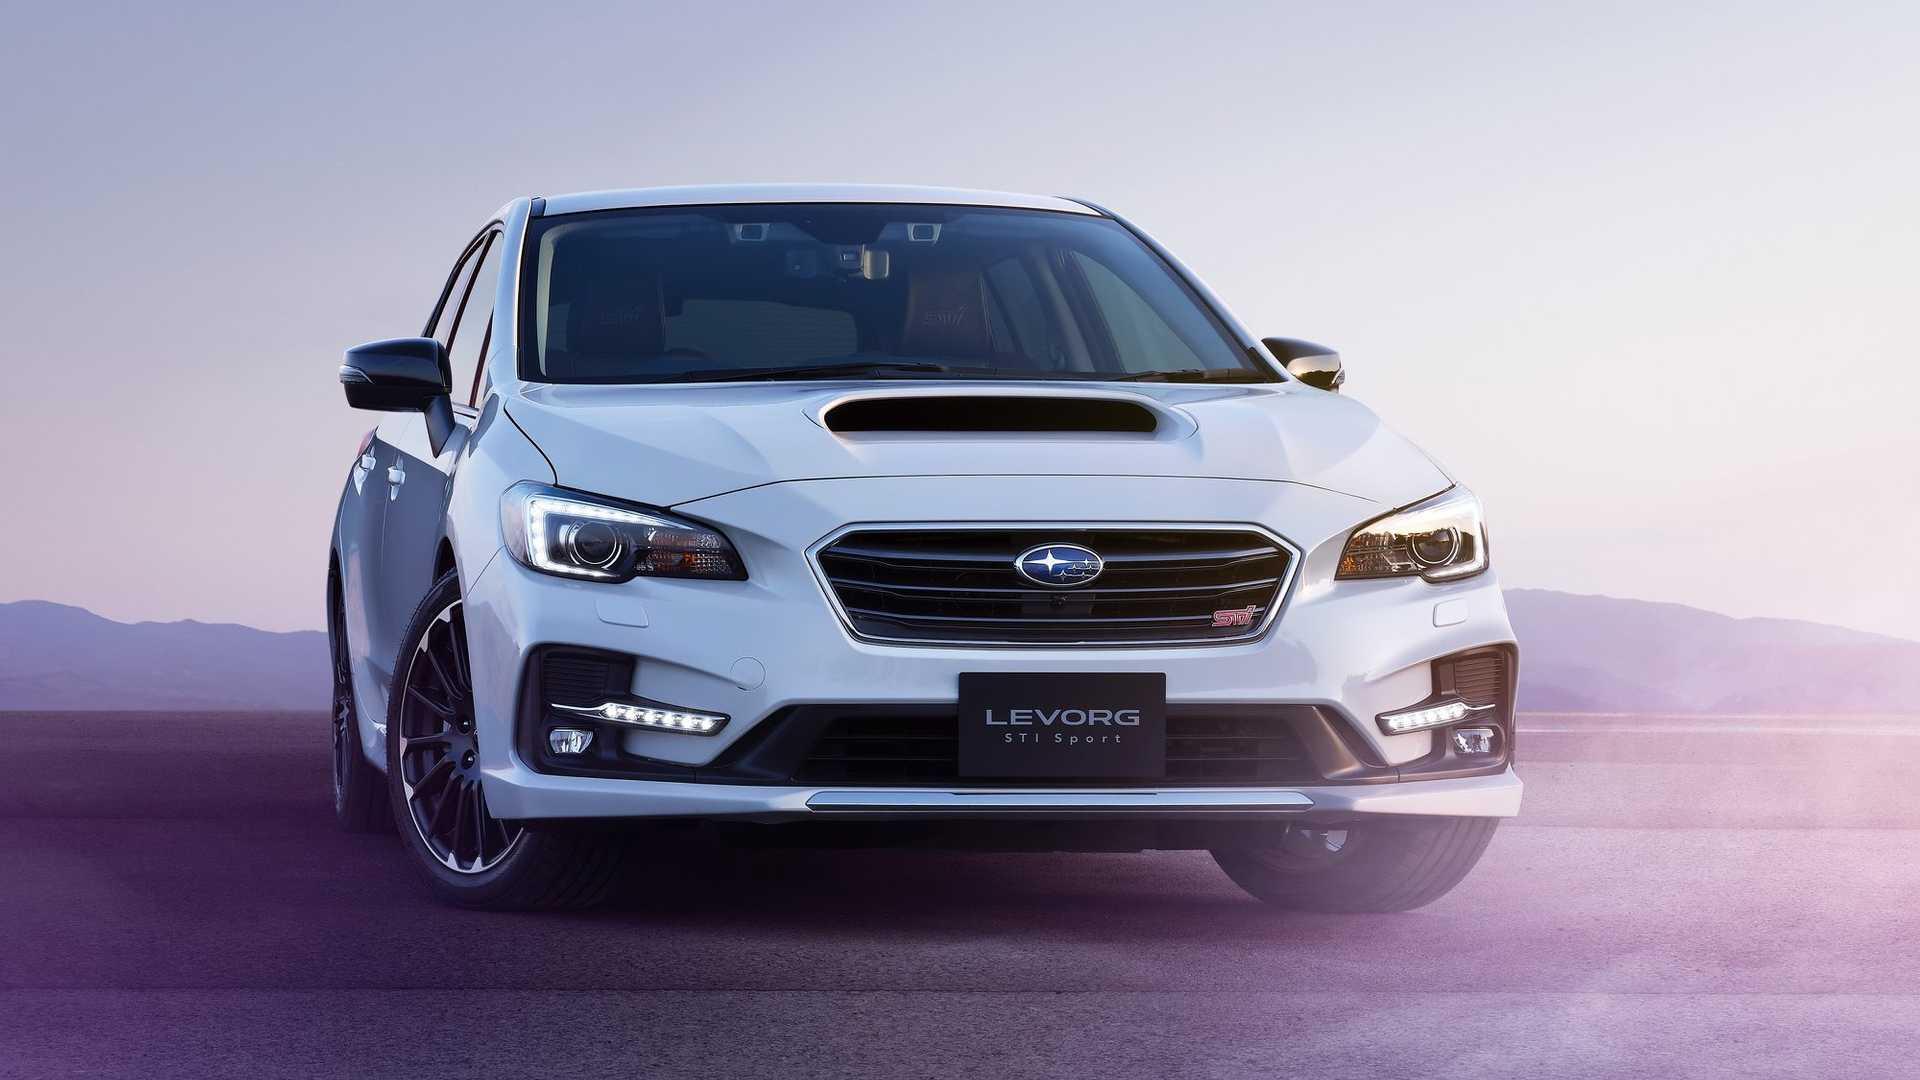 2019_Subaru_Levorg_STI_Sport_0002